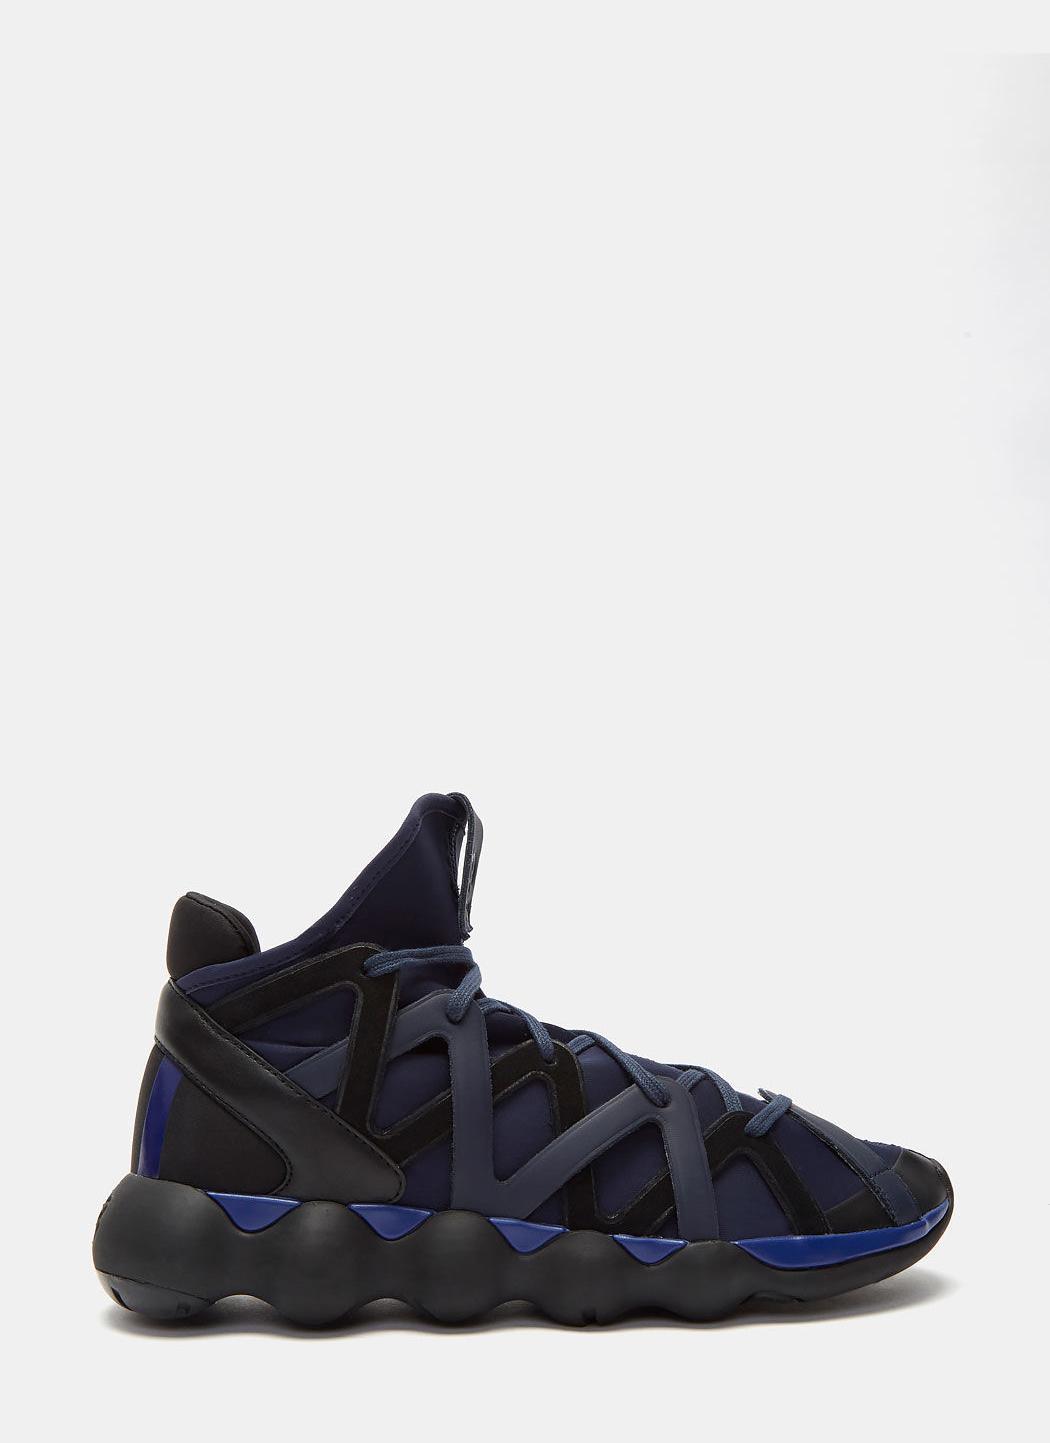 583b07ca65738 Lyst - Y-3 Men s Kyujo High Sneakers In Black And Blue in Black for Men